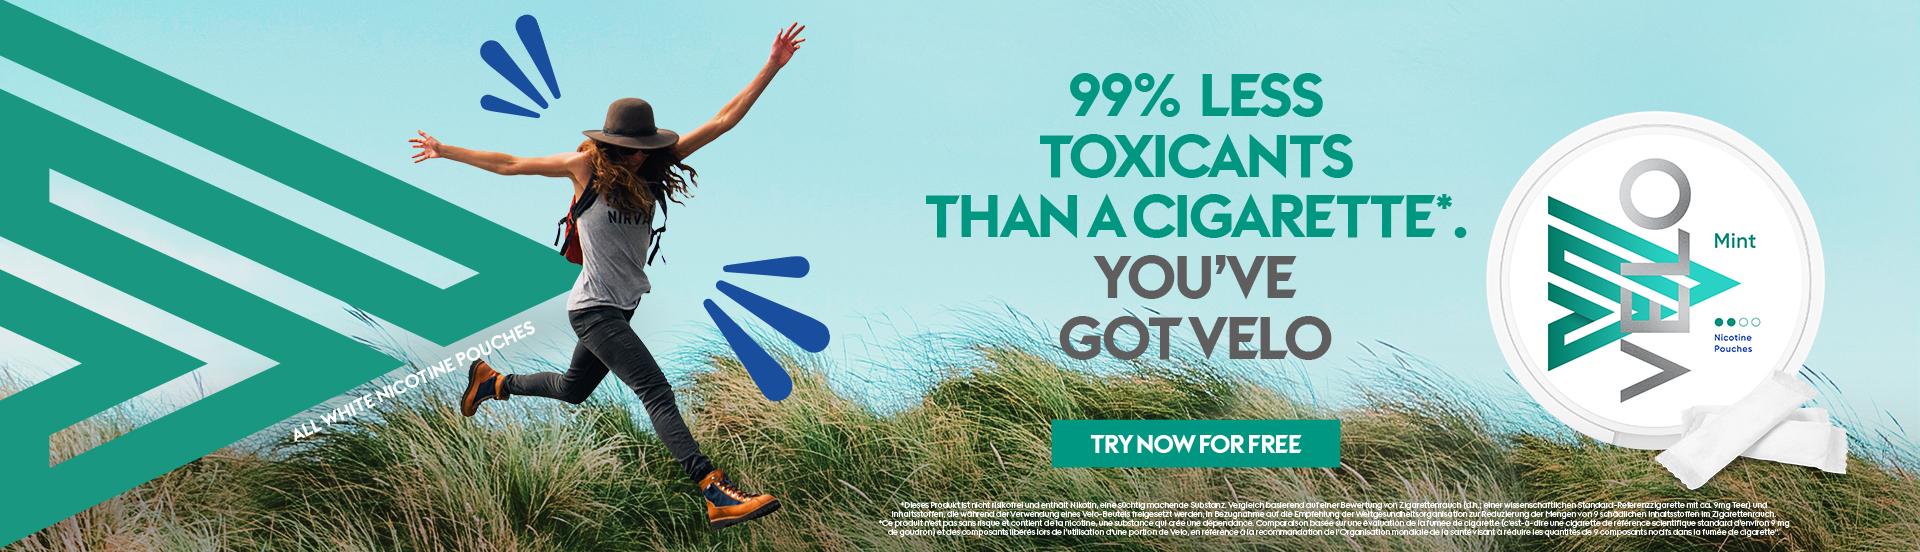 less toxic